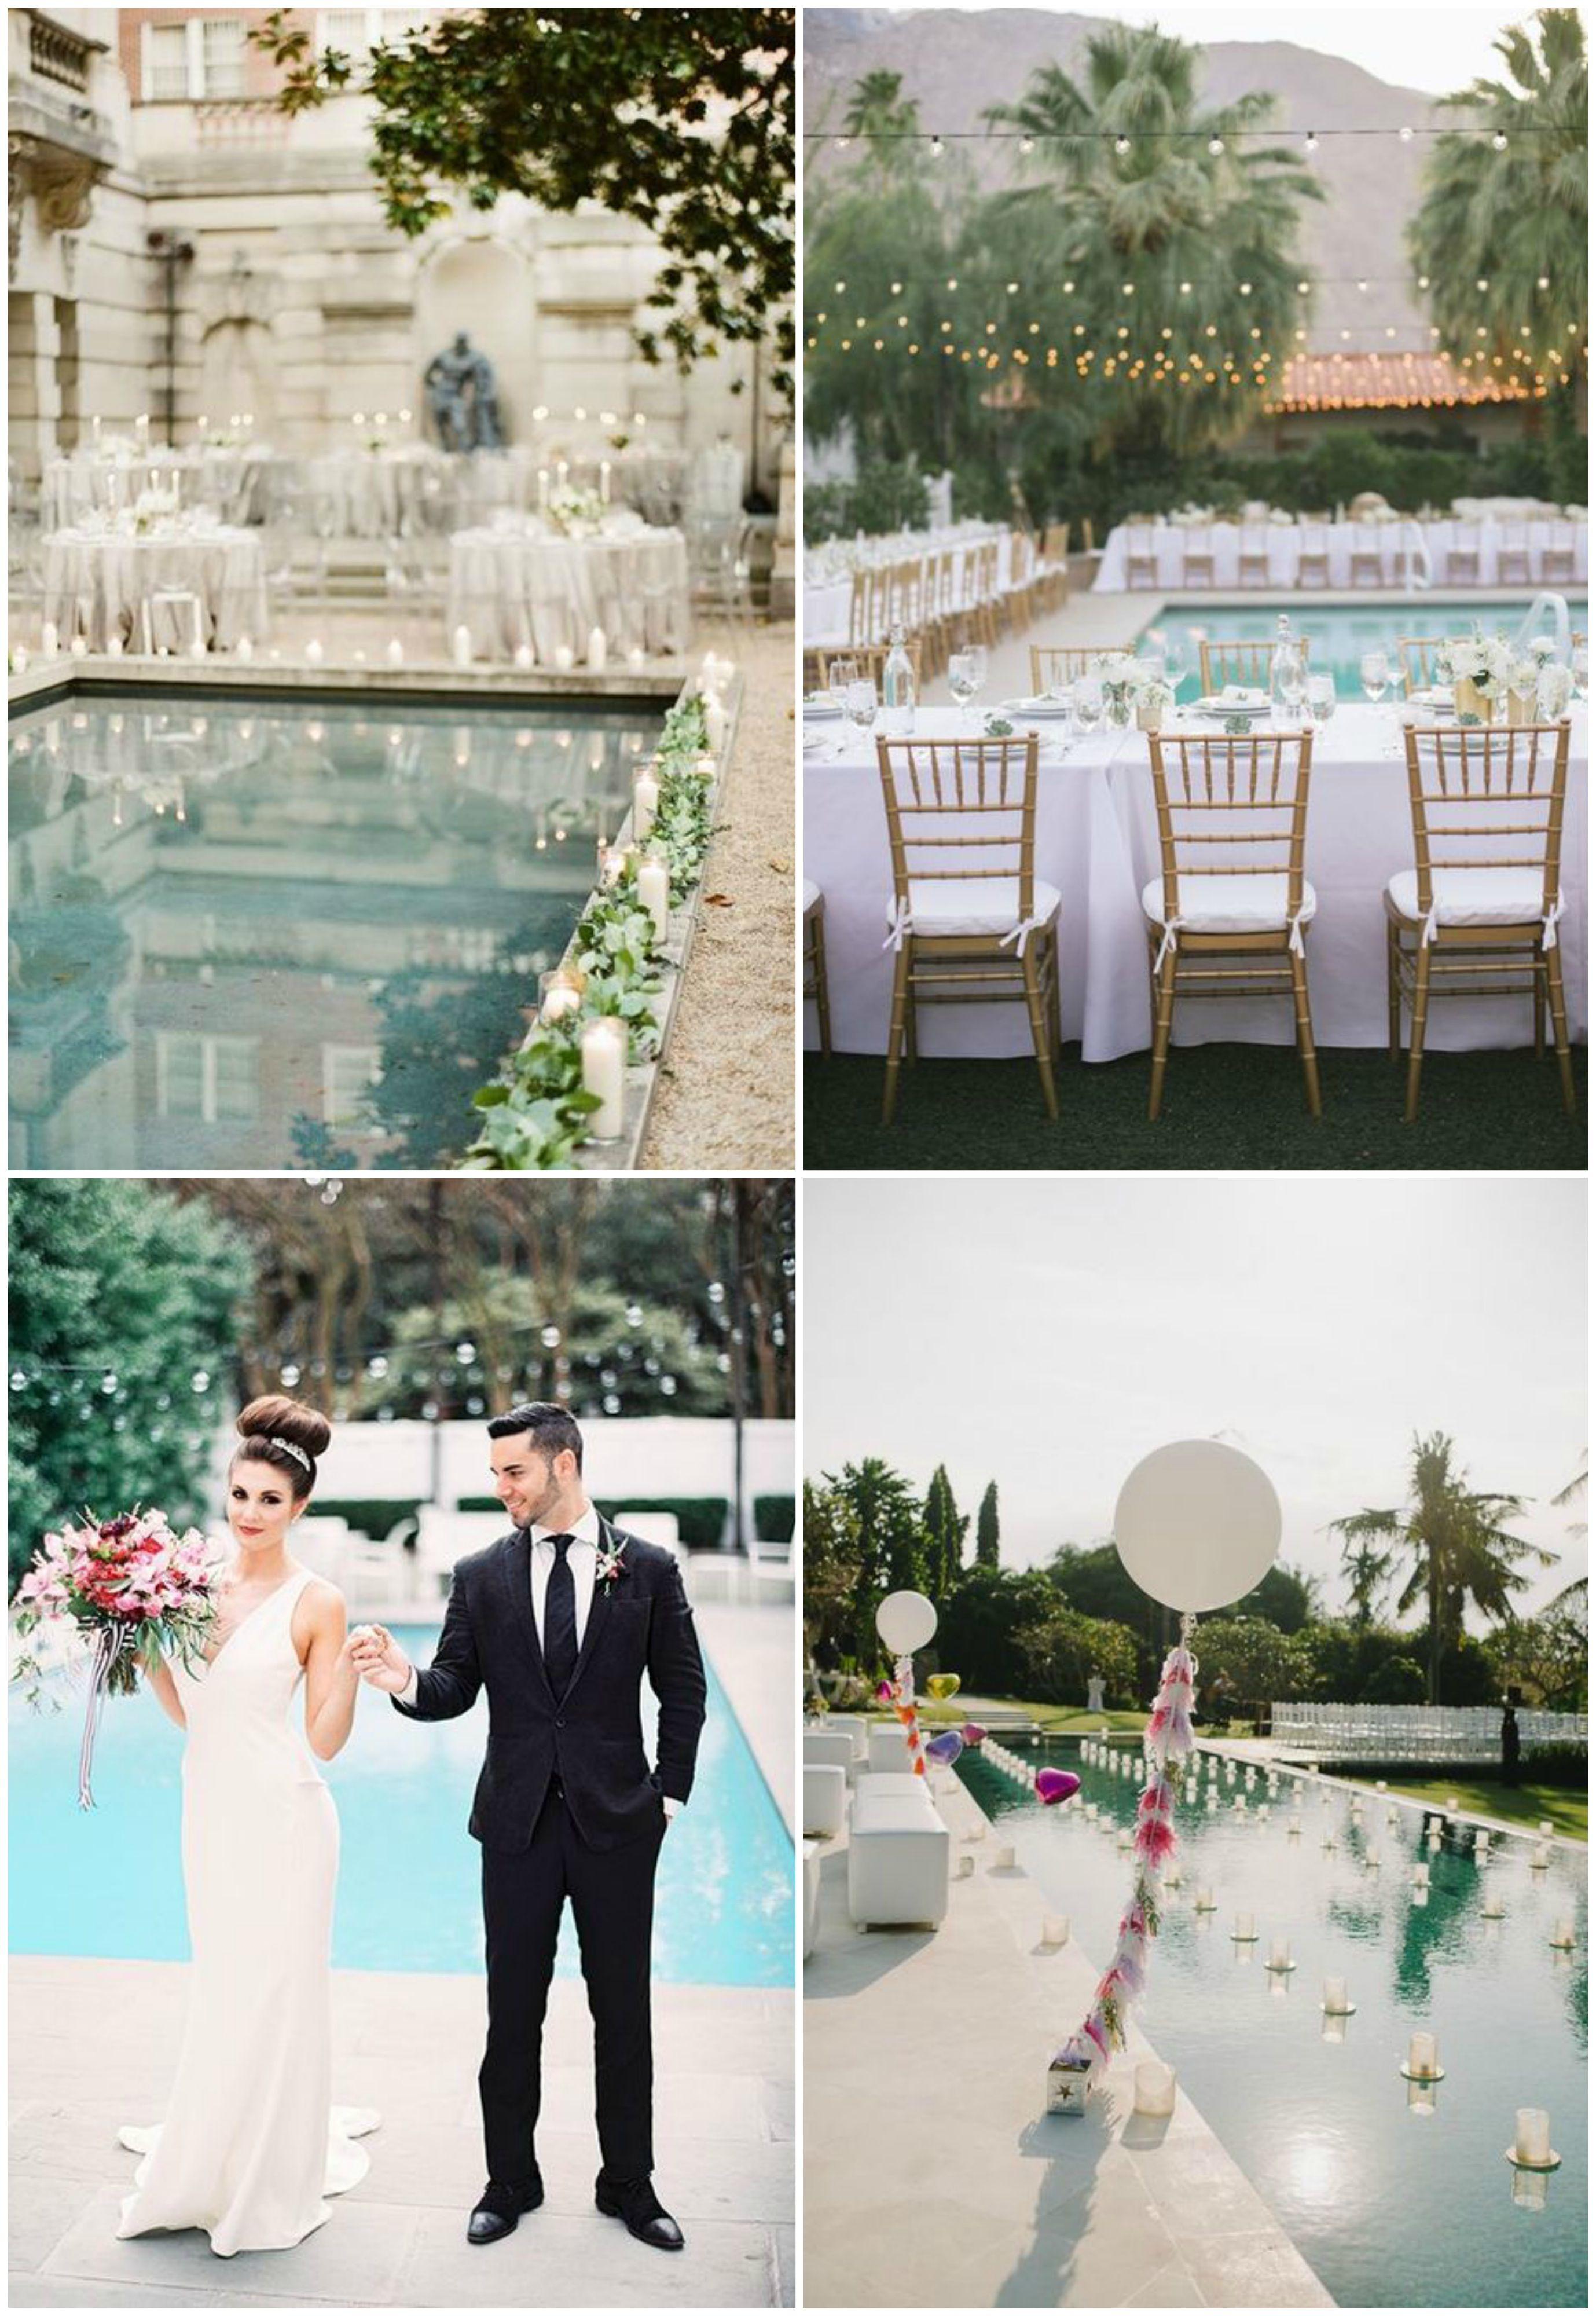 33 Cool Poolside Wedding Ideas Pool Wedding Decorations Pool Wedding Pool Wedding Theme